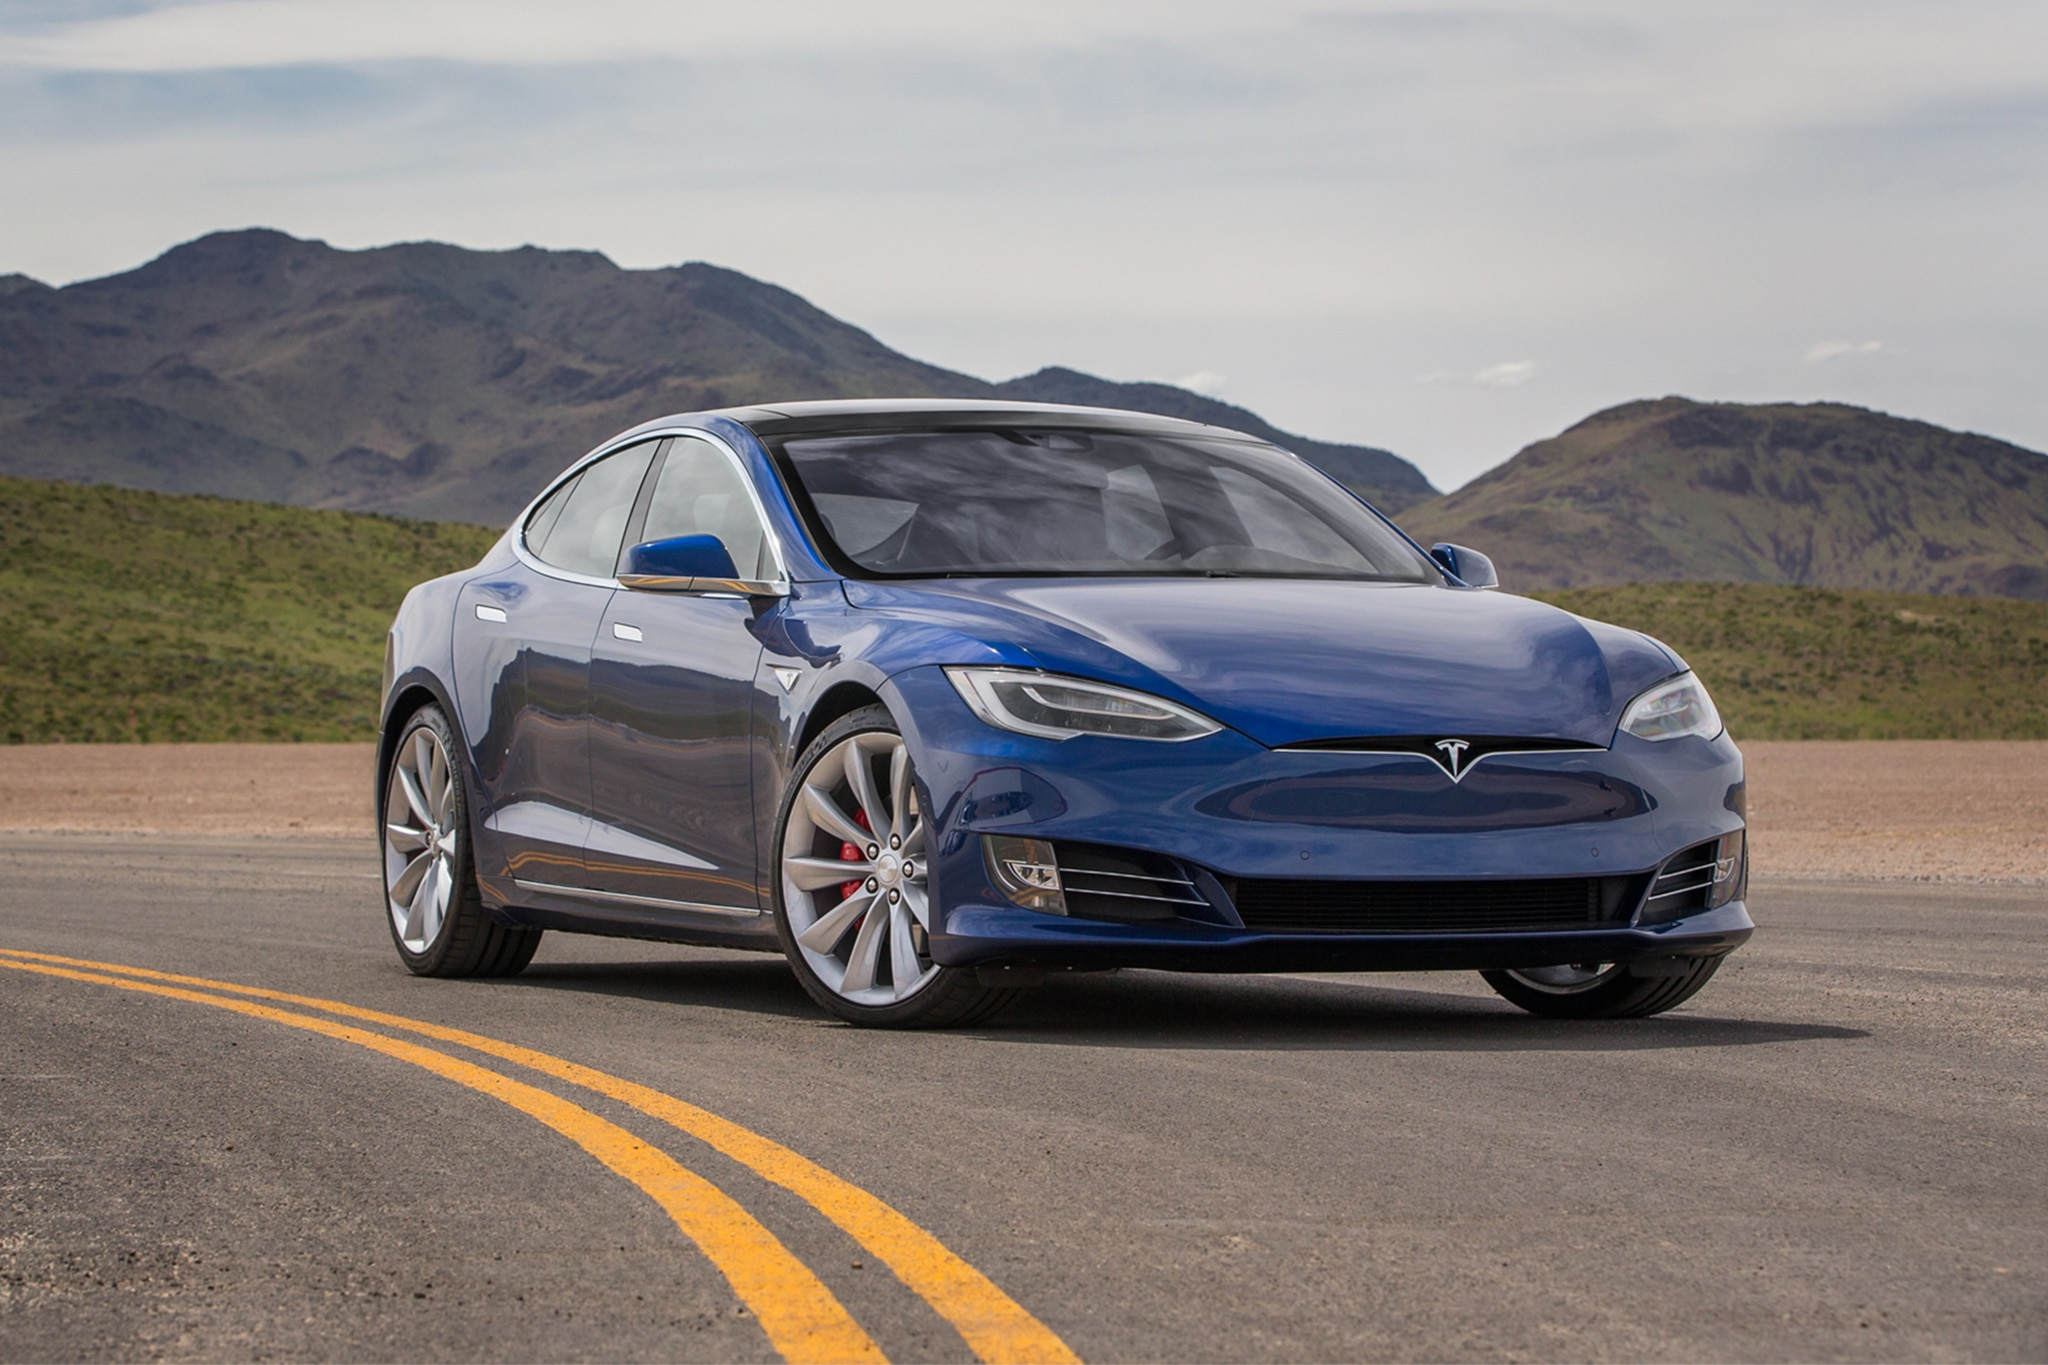 Tesla Model S Q3 2016 Sales Exceeded Mercedes S Class And